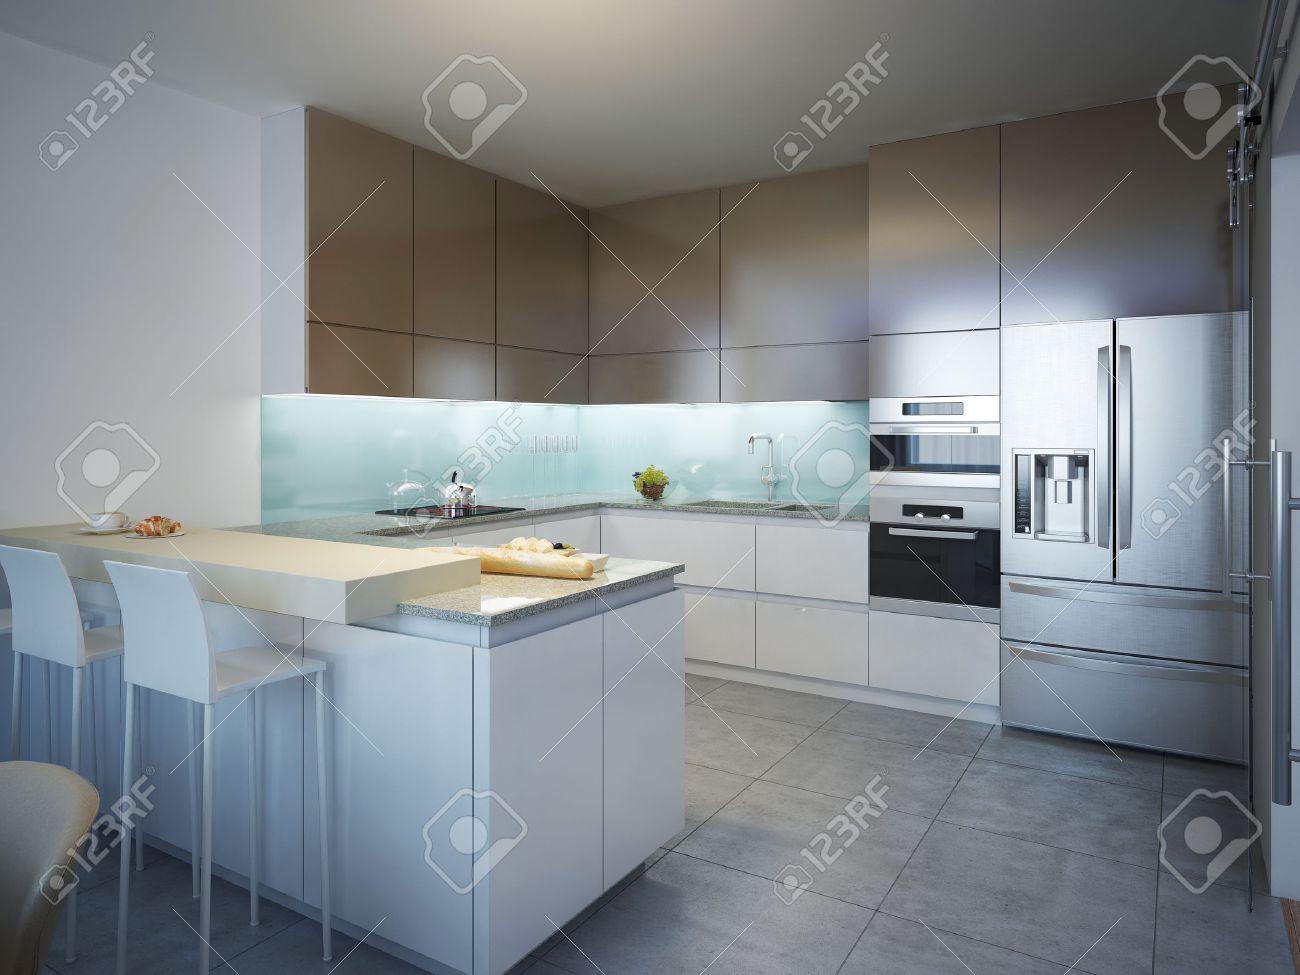 Idea Of Contemporary Kitchen . Kitchen With White And Brown Matt ...